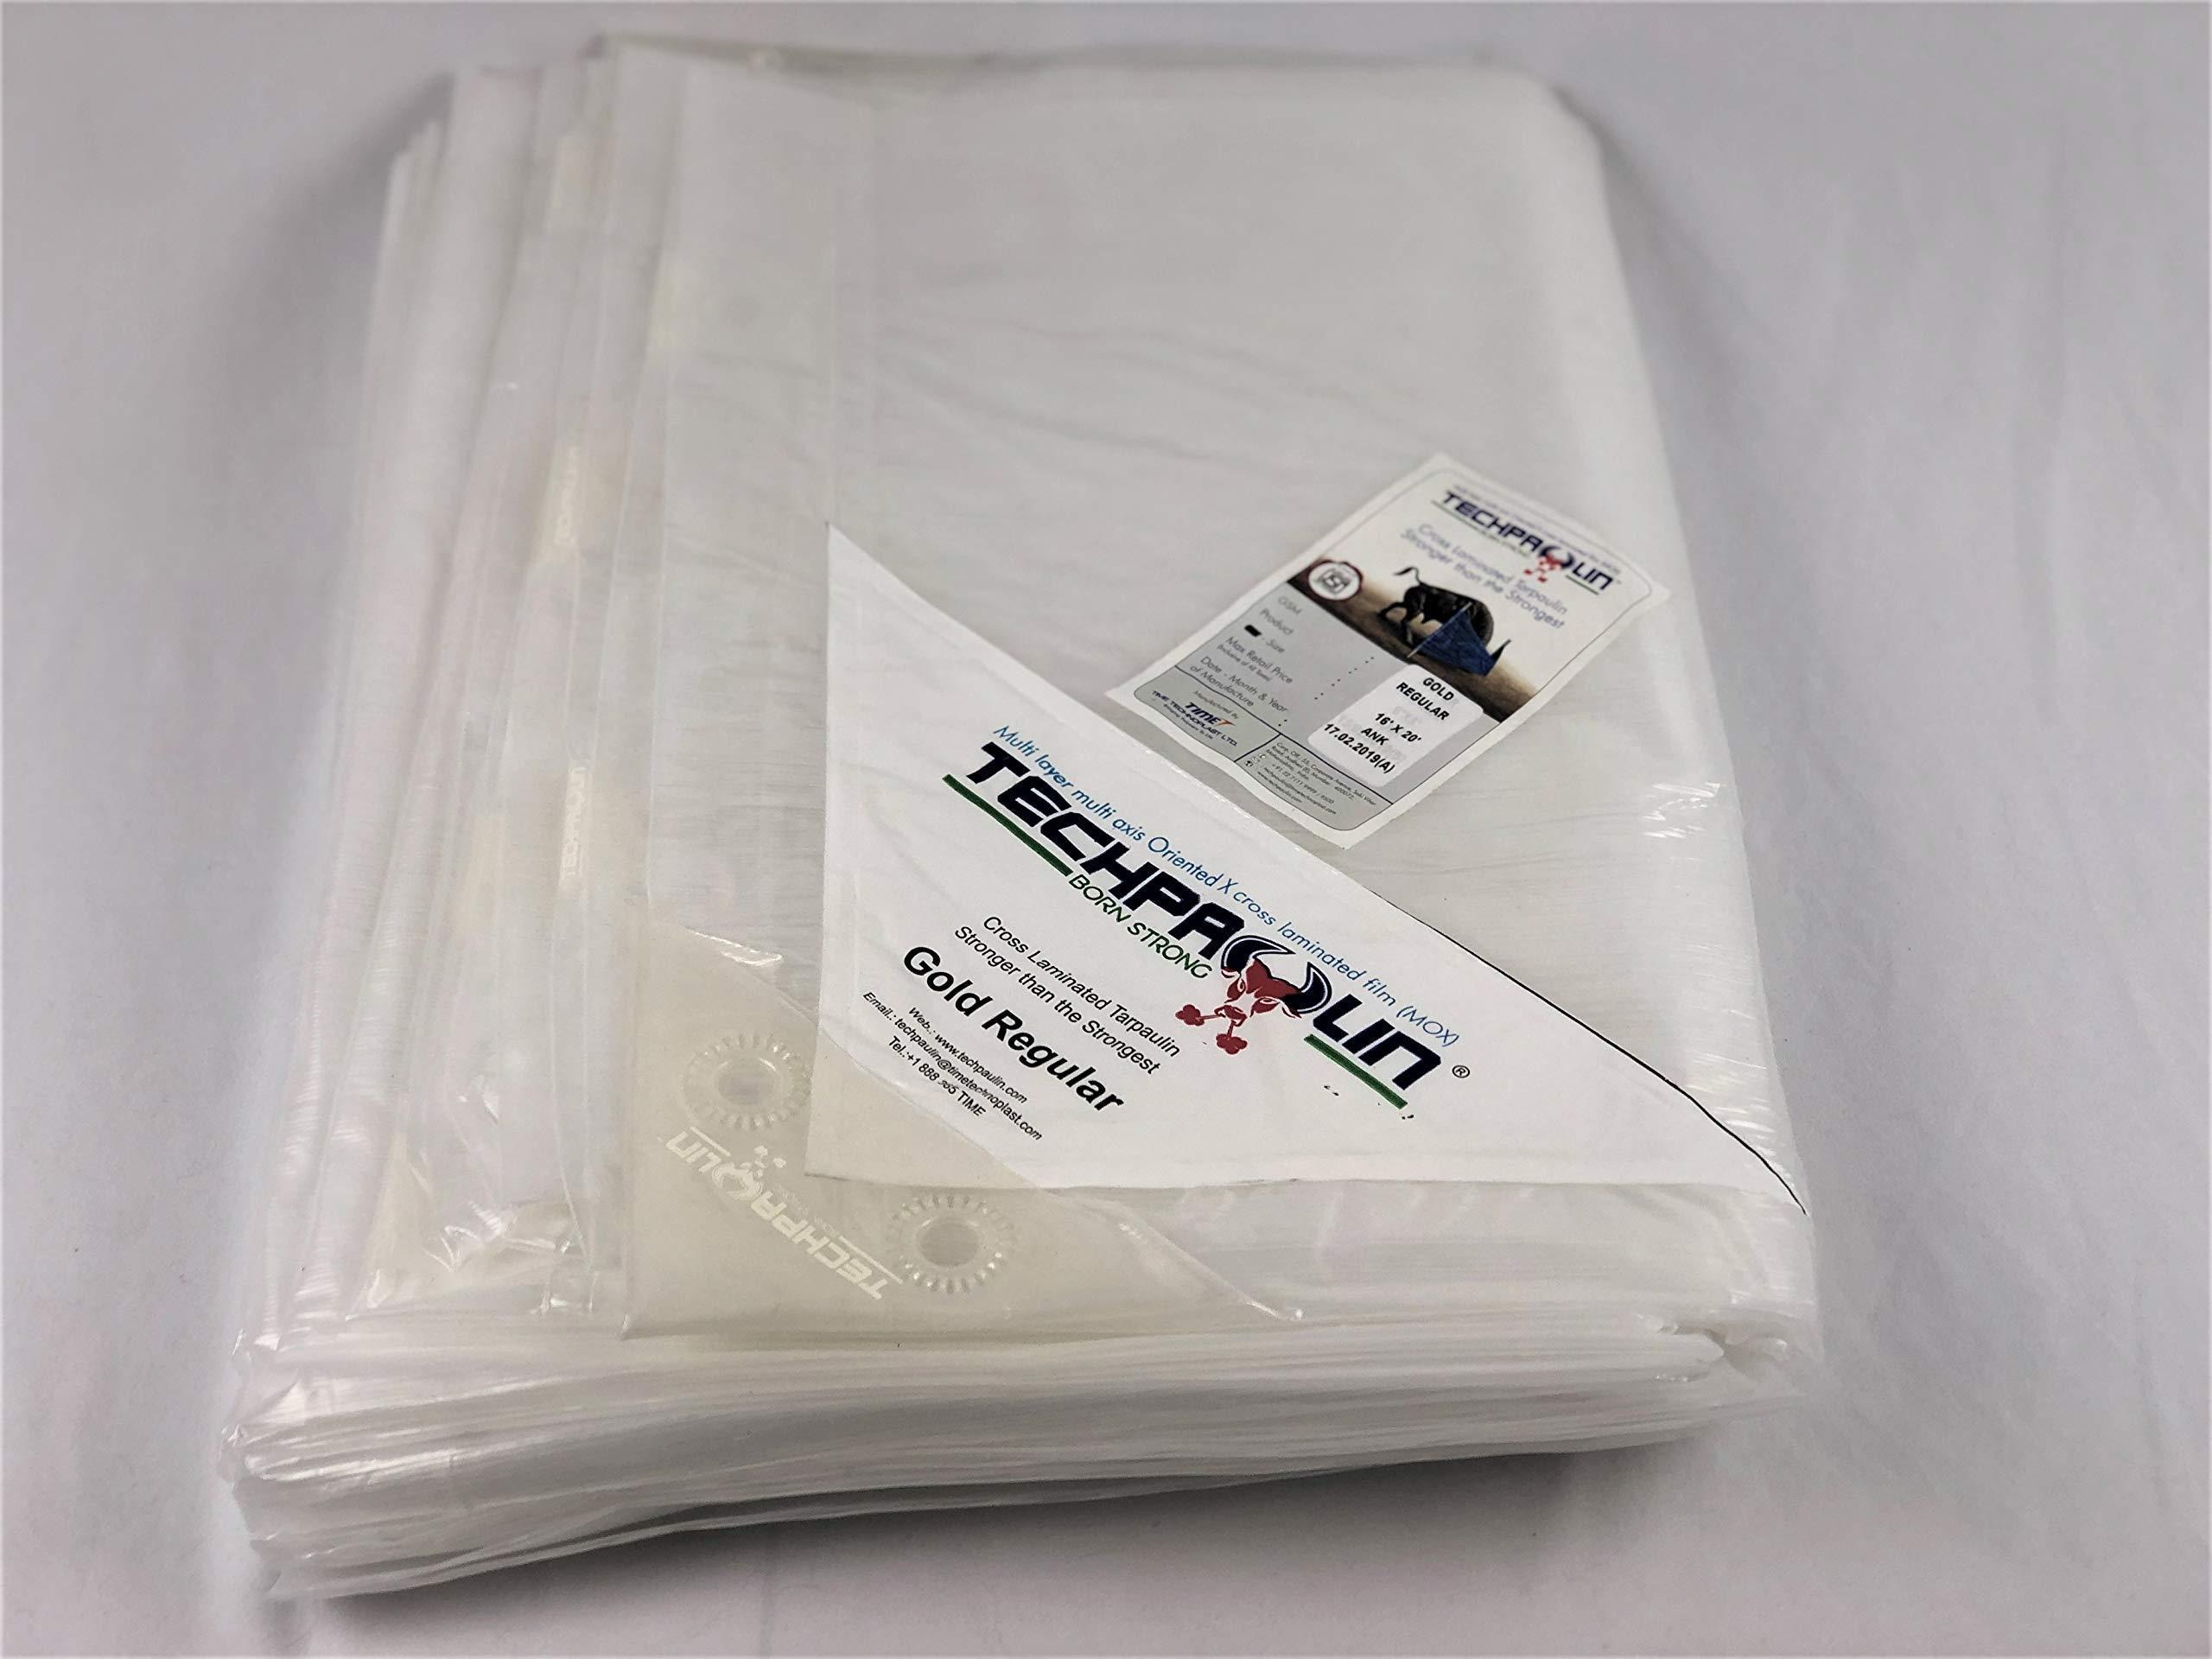 20x25 Heavy Duty Clear Tarp, MOX Film Technology, Premium tarp, Anti-Tear, Waterproof, UV Resistant by Queen of Tarps